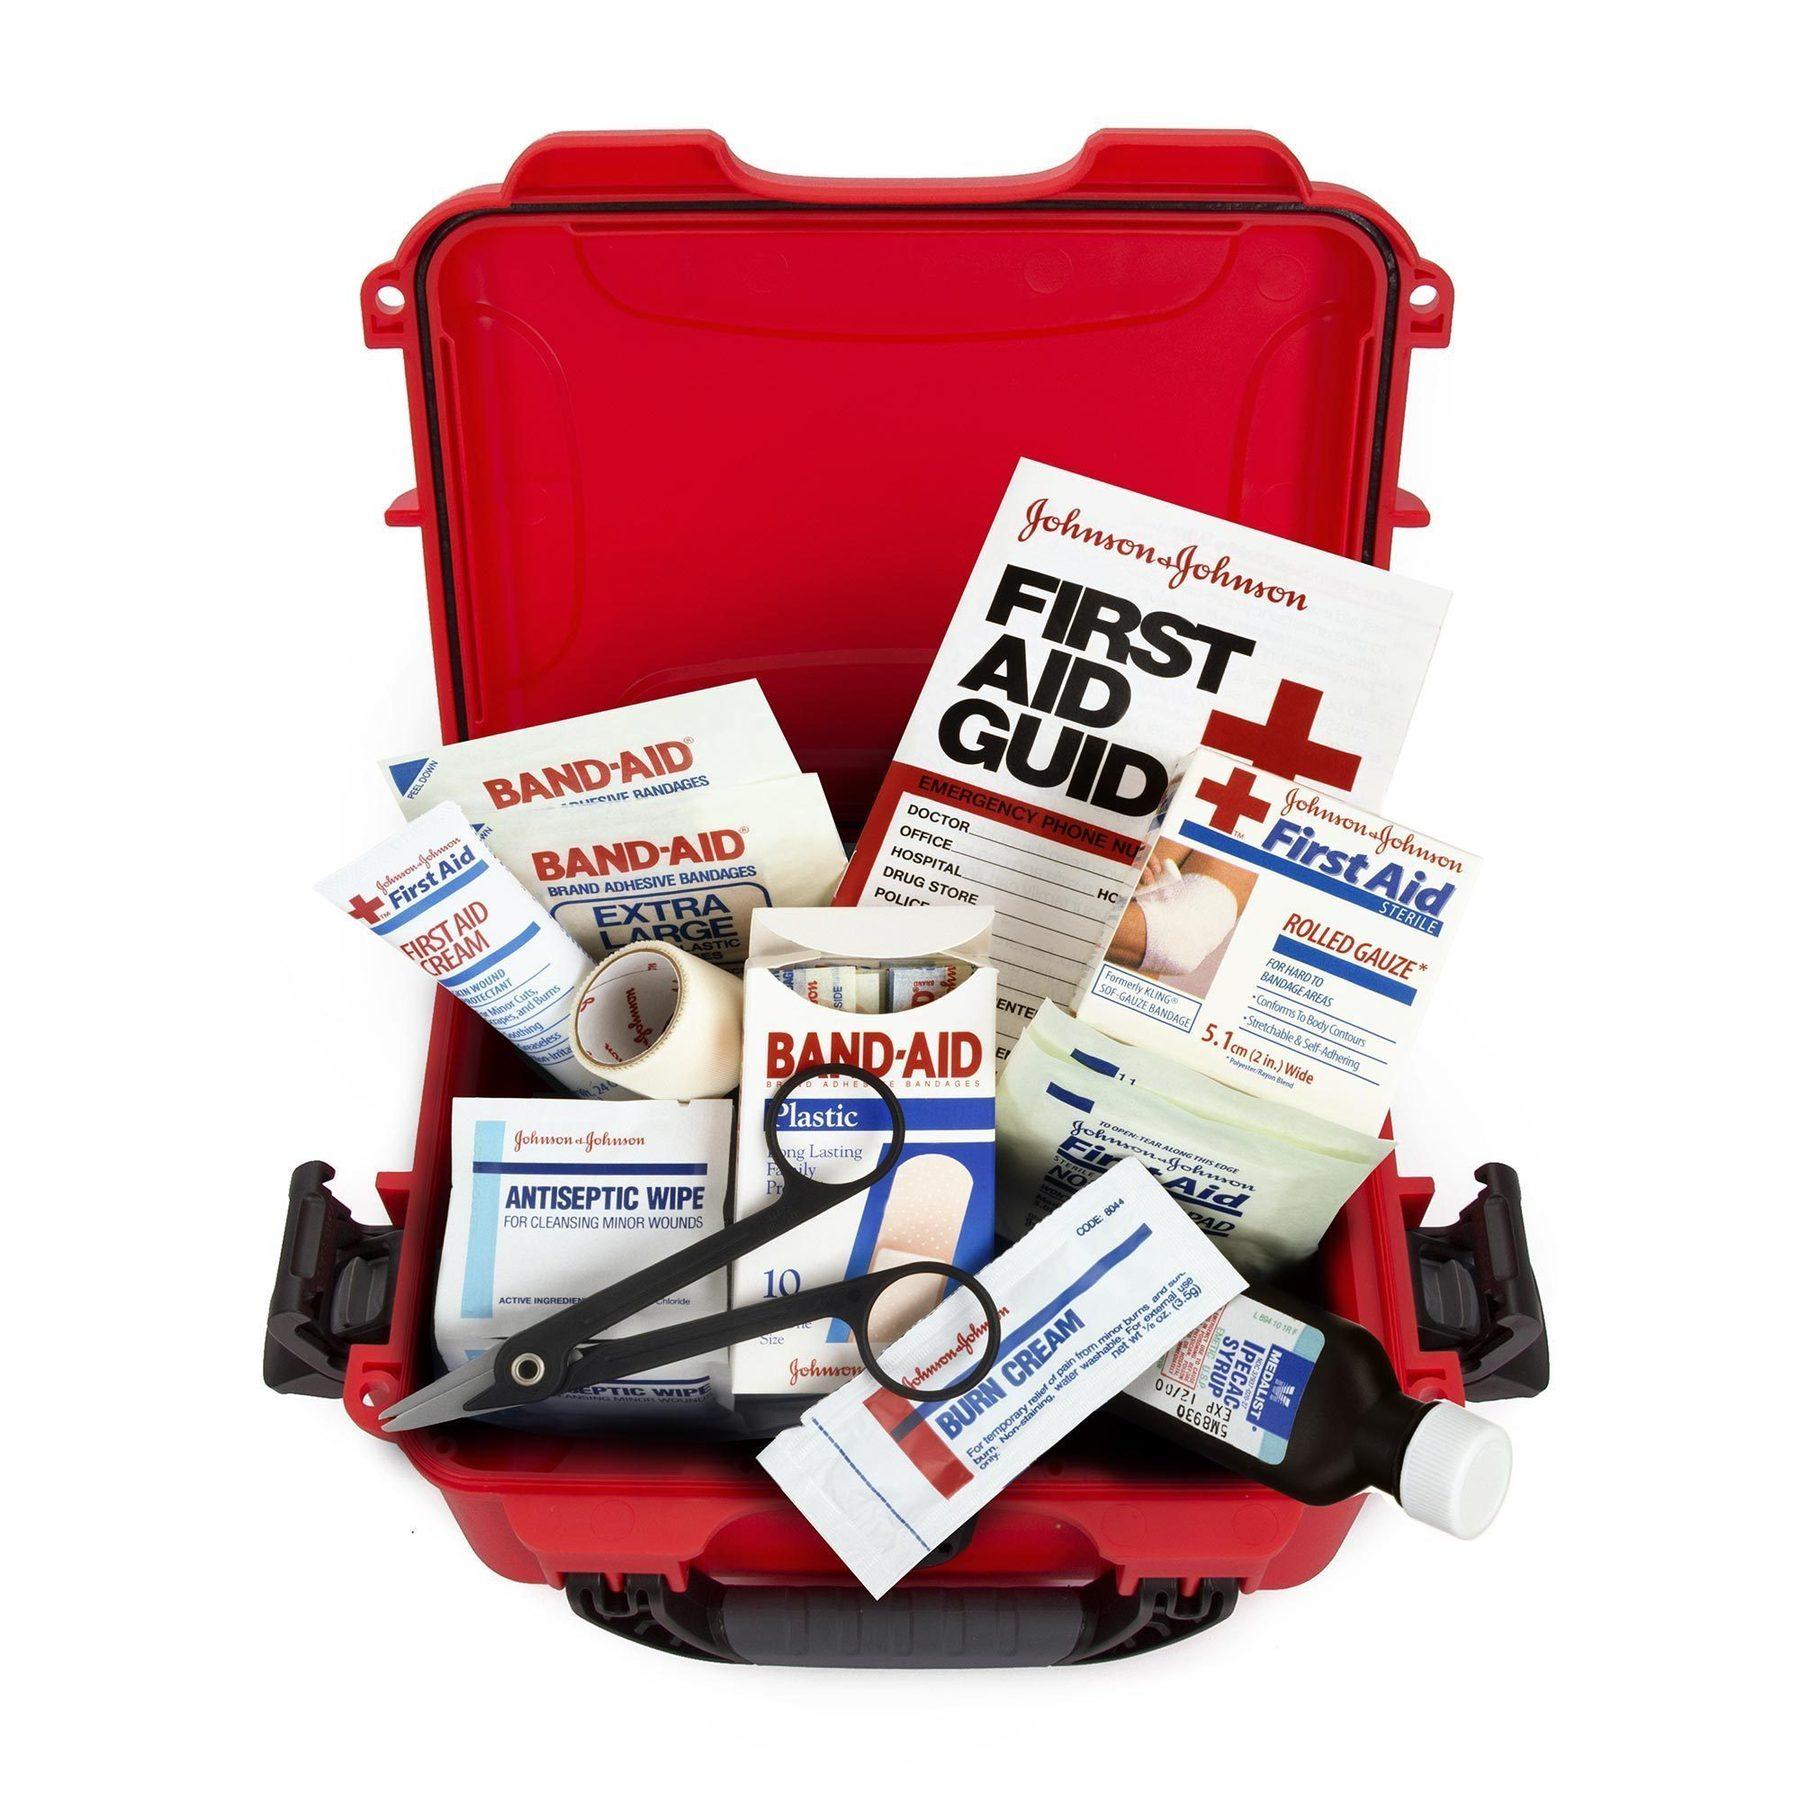 NANUK 904 First Aid Case - Erste-Hilfe Schutzkoffer